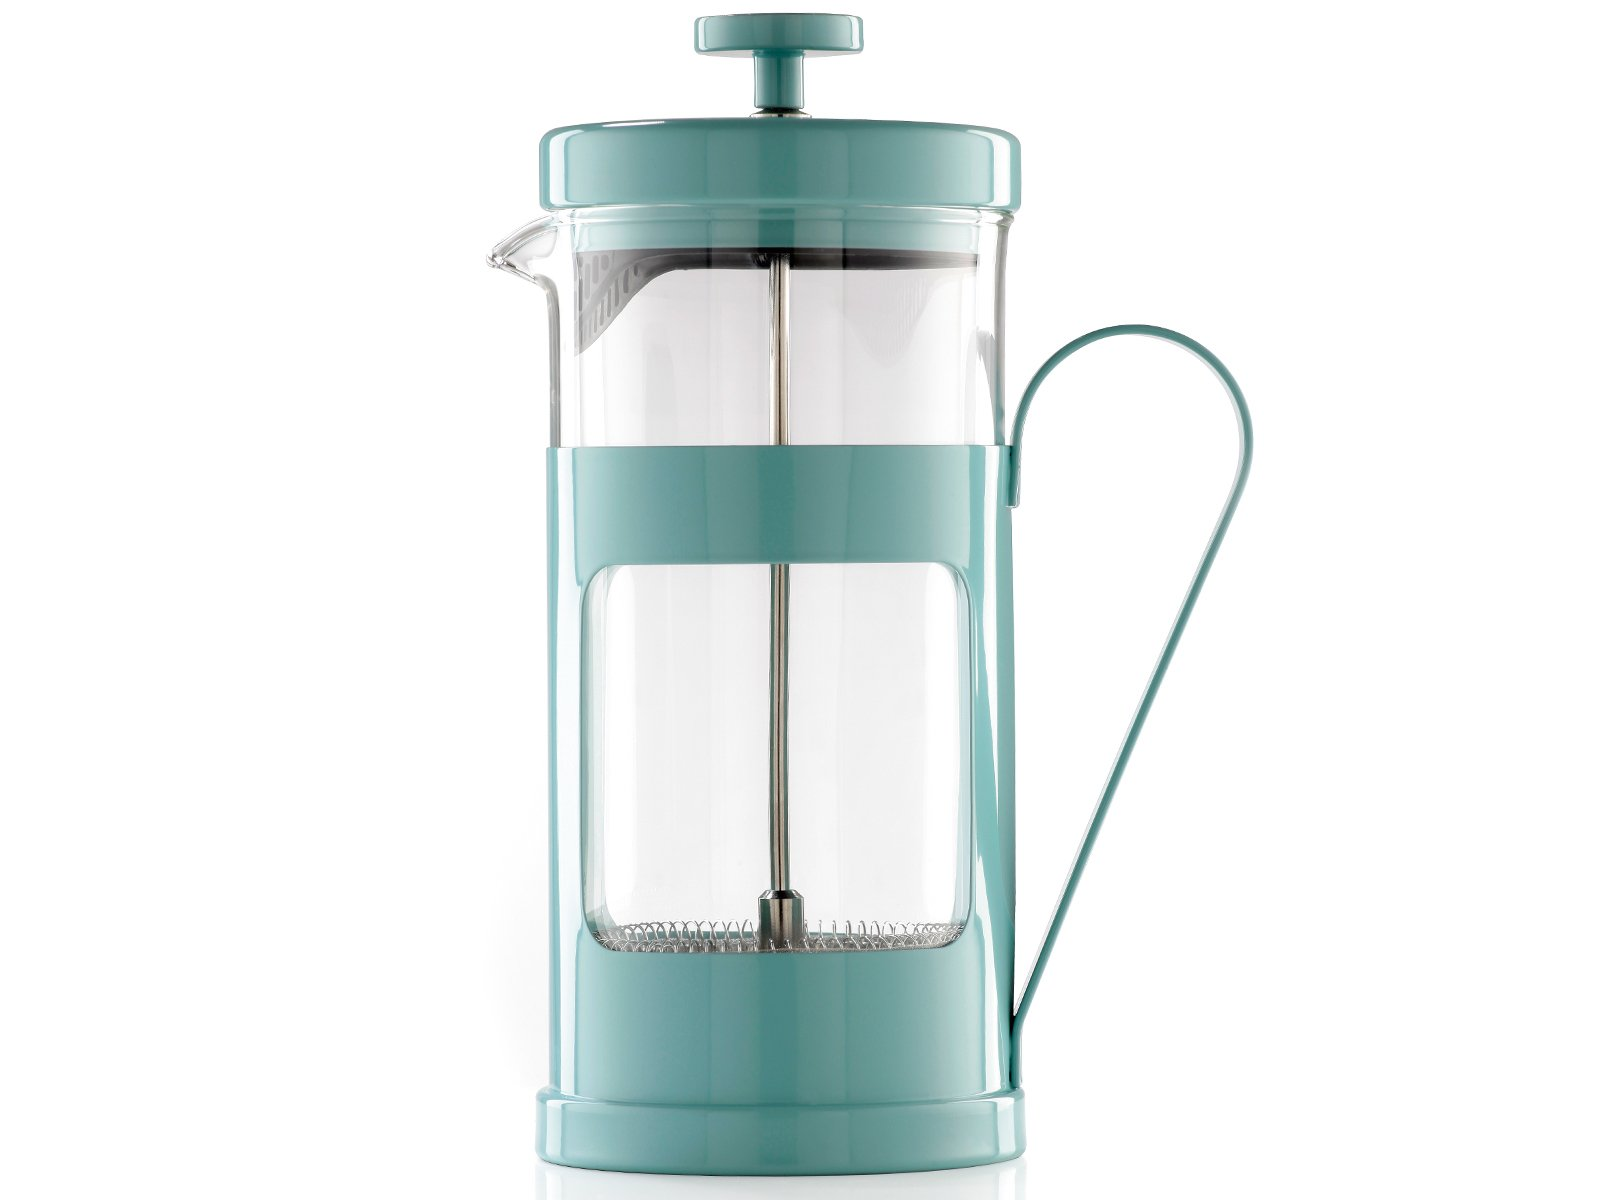 La Cafeteiere Monaco Retro Blue 8 Cup French Press Coffee Maker by CreativeTops